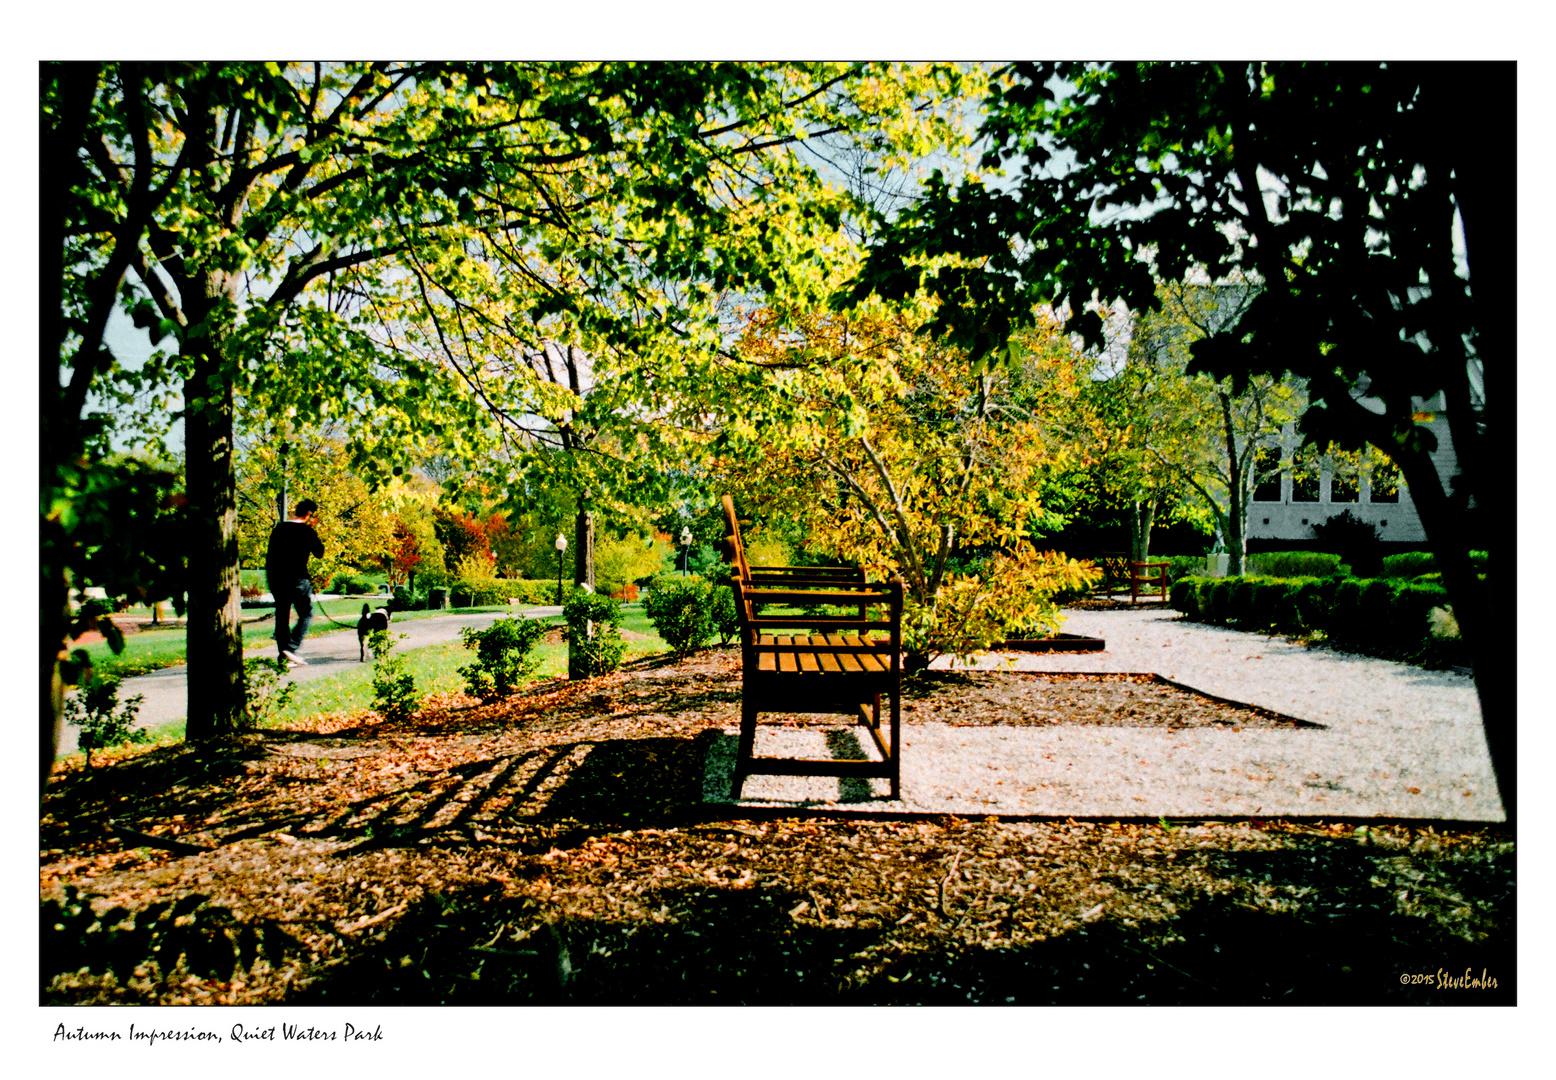 Autumn Impression, Quiet Waters Park